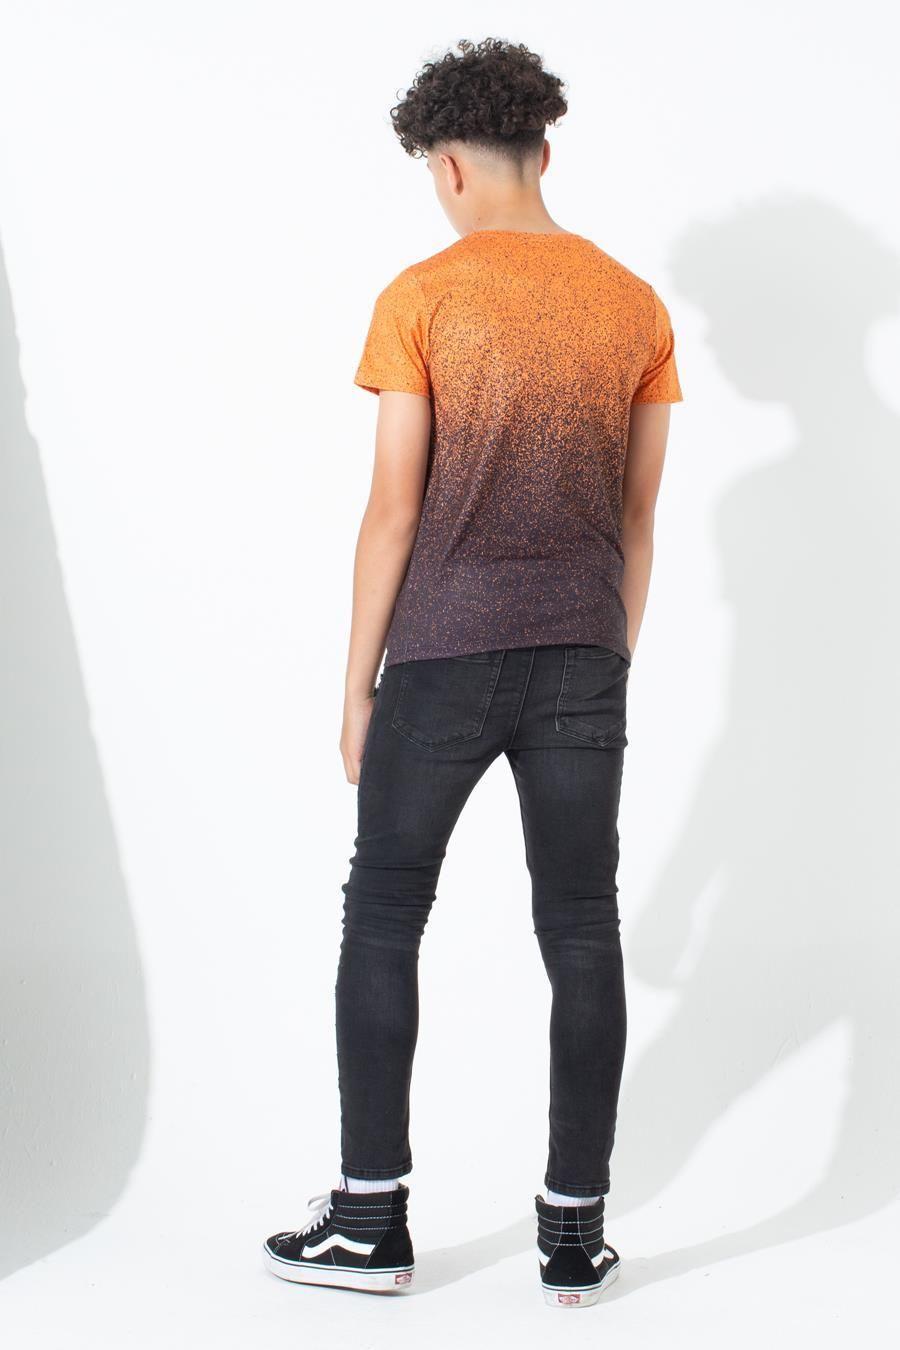 Hype Orange Speckle Fade Kids T-Shirt 13Y